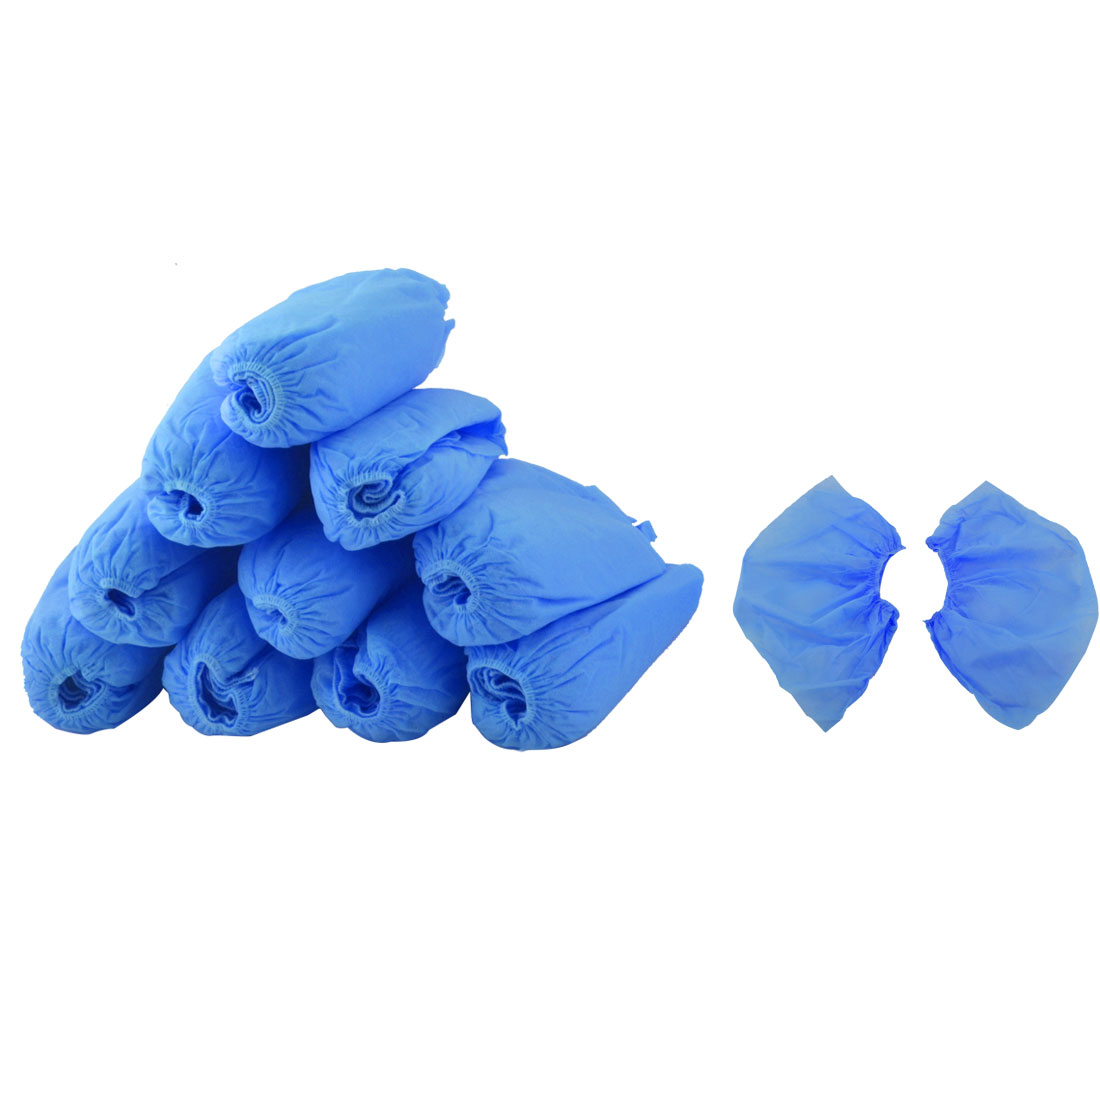 Non-woven Fabrics Elastic Band Disposable Carpet Clean Shoes Cover Blue 100pcs